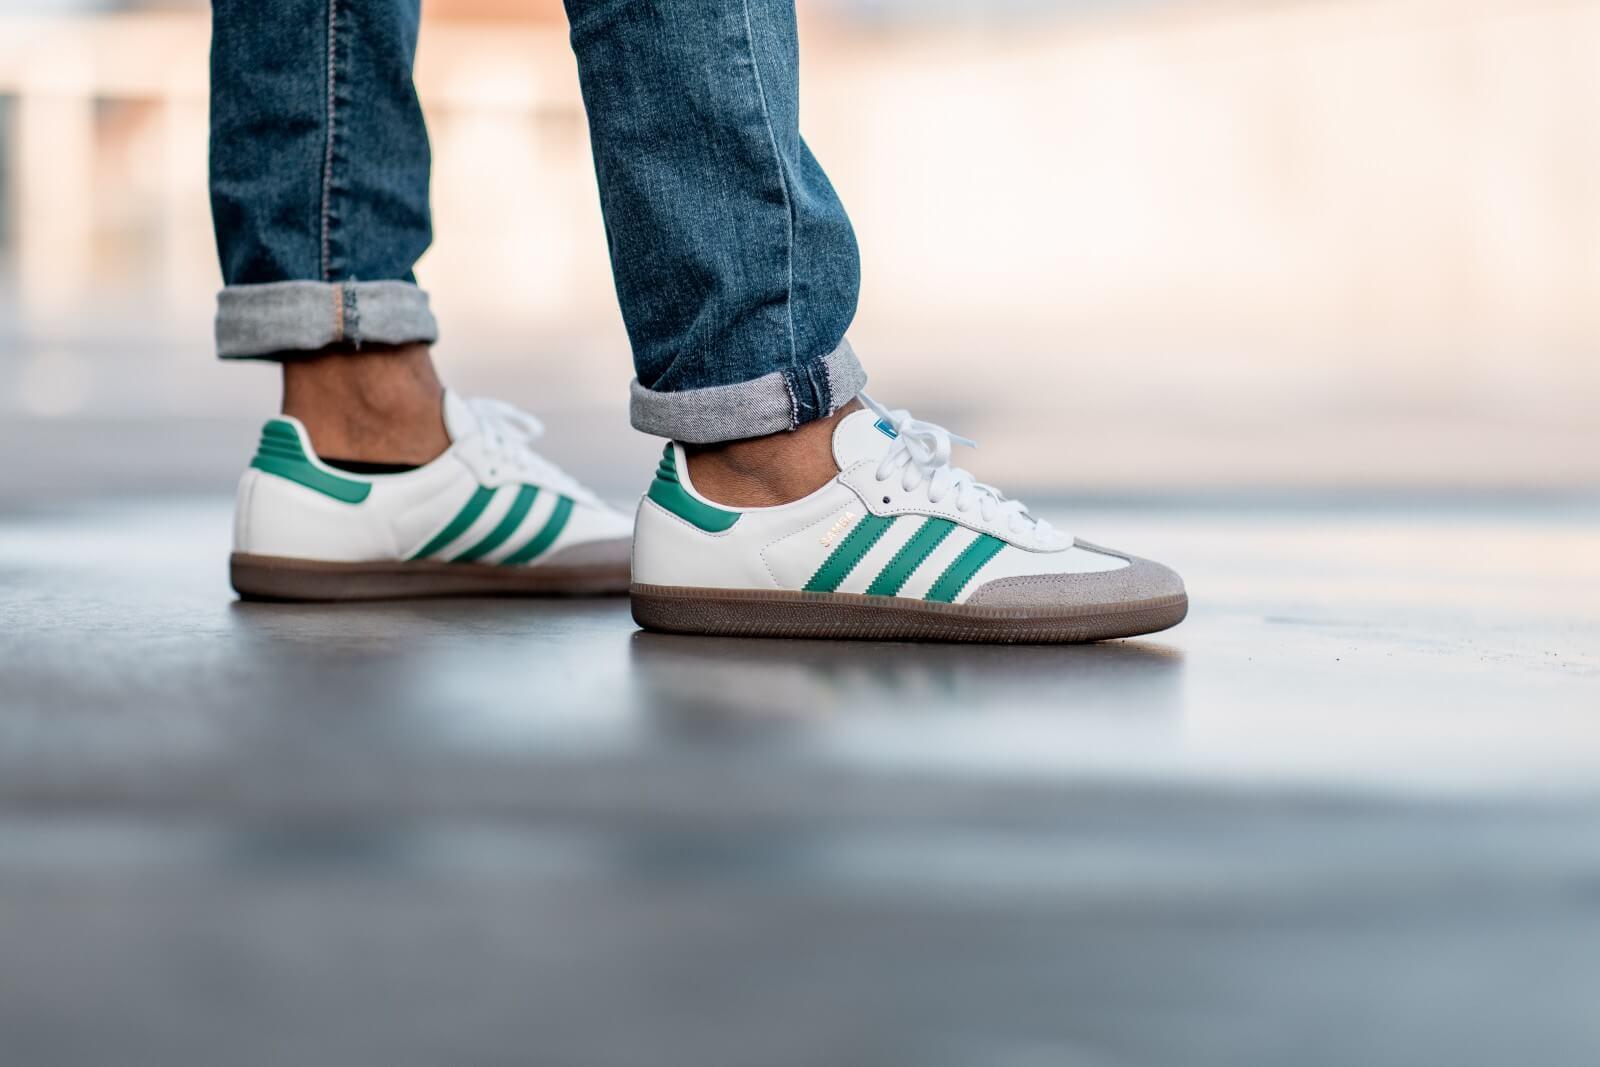 Adidas Samba OG Footwear WhiteGreen EF6552